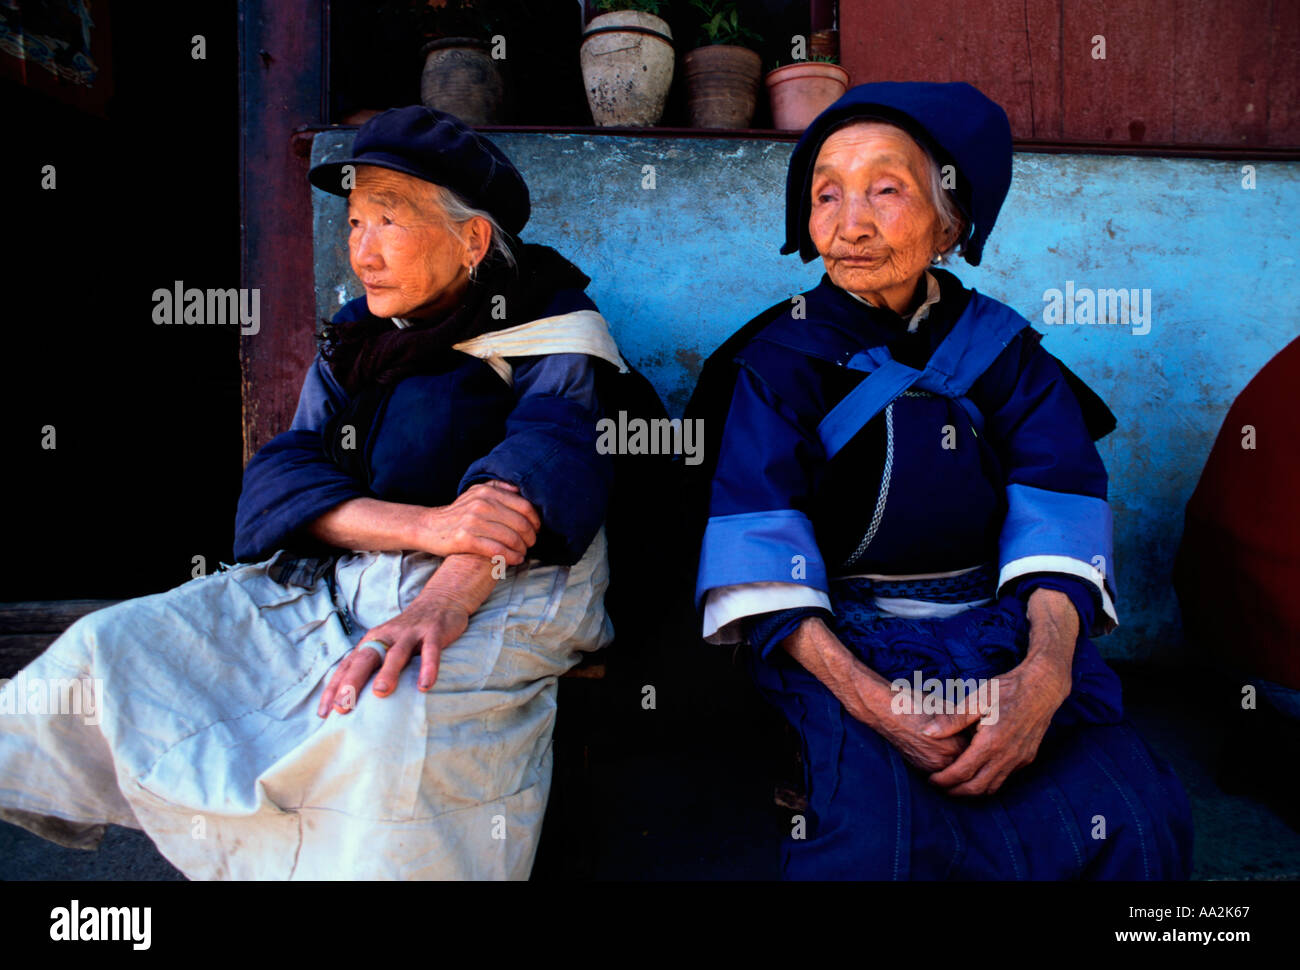 Ethnic mature women